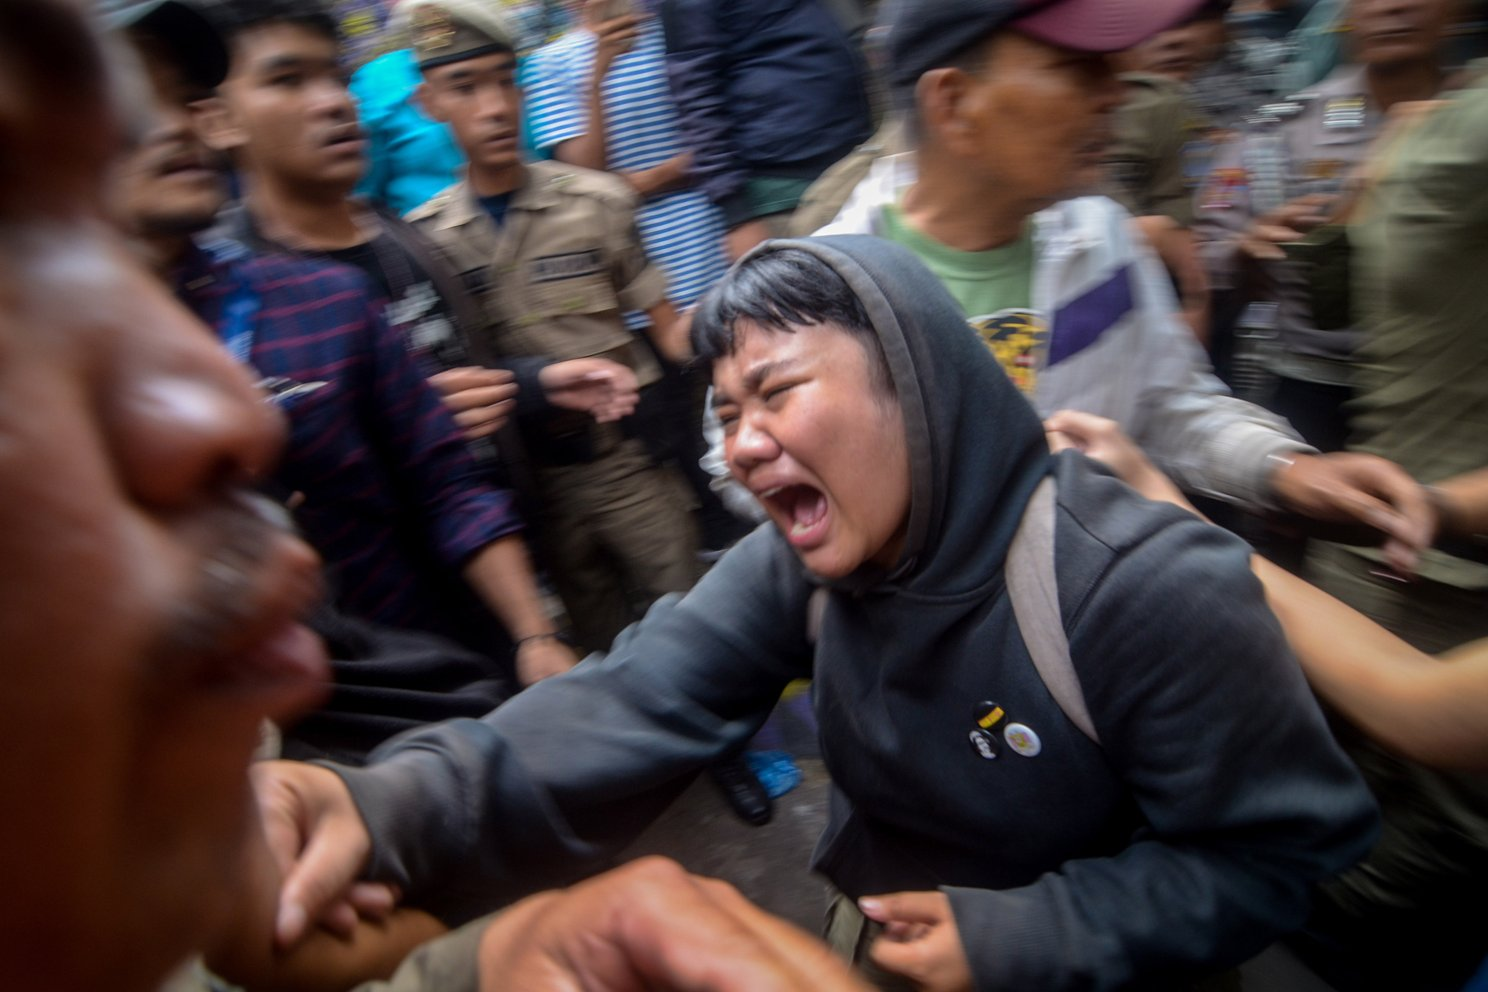 Seorang warga menangis histeris saat penggusuran permukiman Tamansari di Bandung, Jawa Barat, Kamis (12/12/2019). Upaya penggusuran tersebut berakhir ricuh setelah Satpol PP memaksa warga dan aktivis mahasiswa untuk mengosongkan tempat tinggalnya di lahan sengketa di mana proses sidang sengketa lahan masih berlangsung di PTUN Bandung.